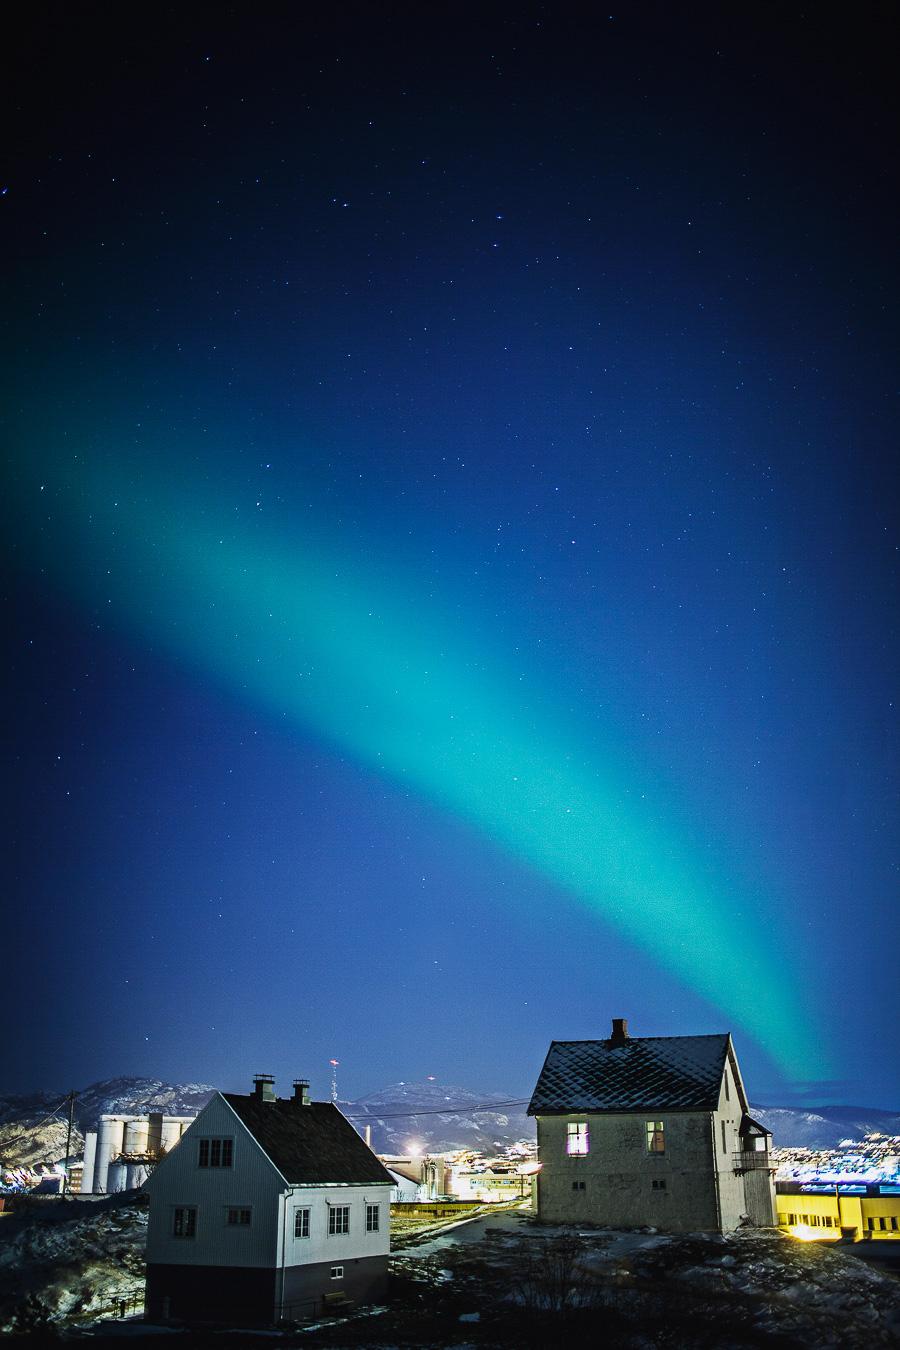 Northern lights dancing over Bodø city